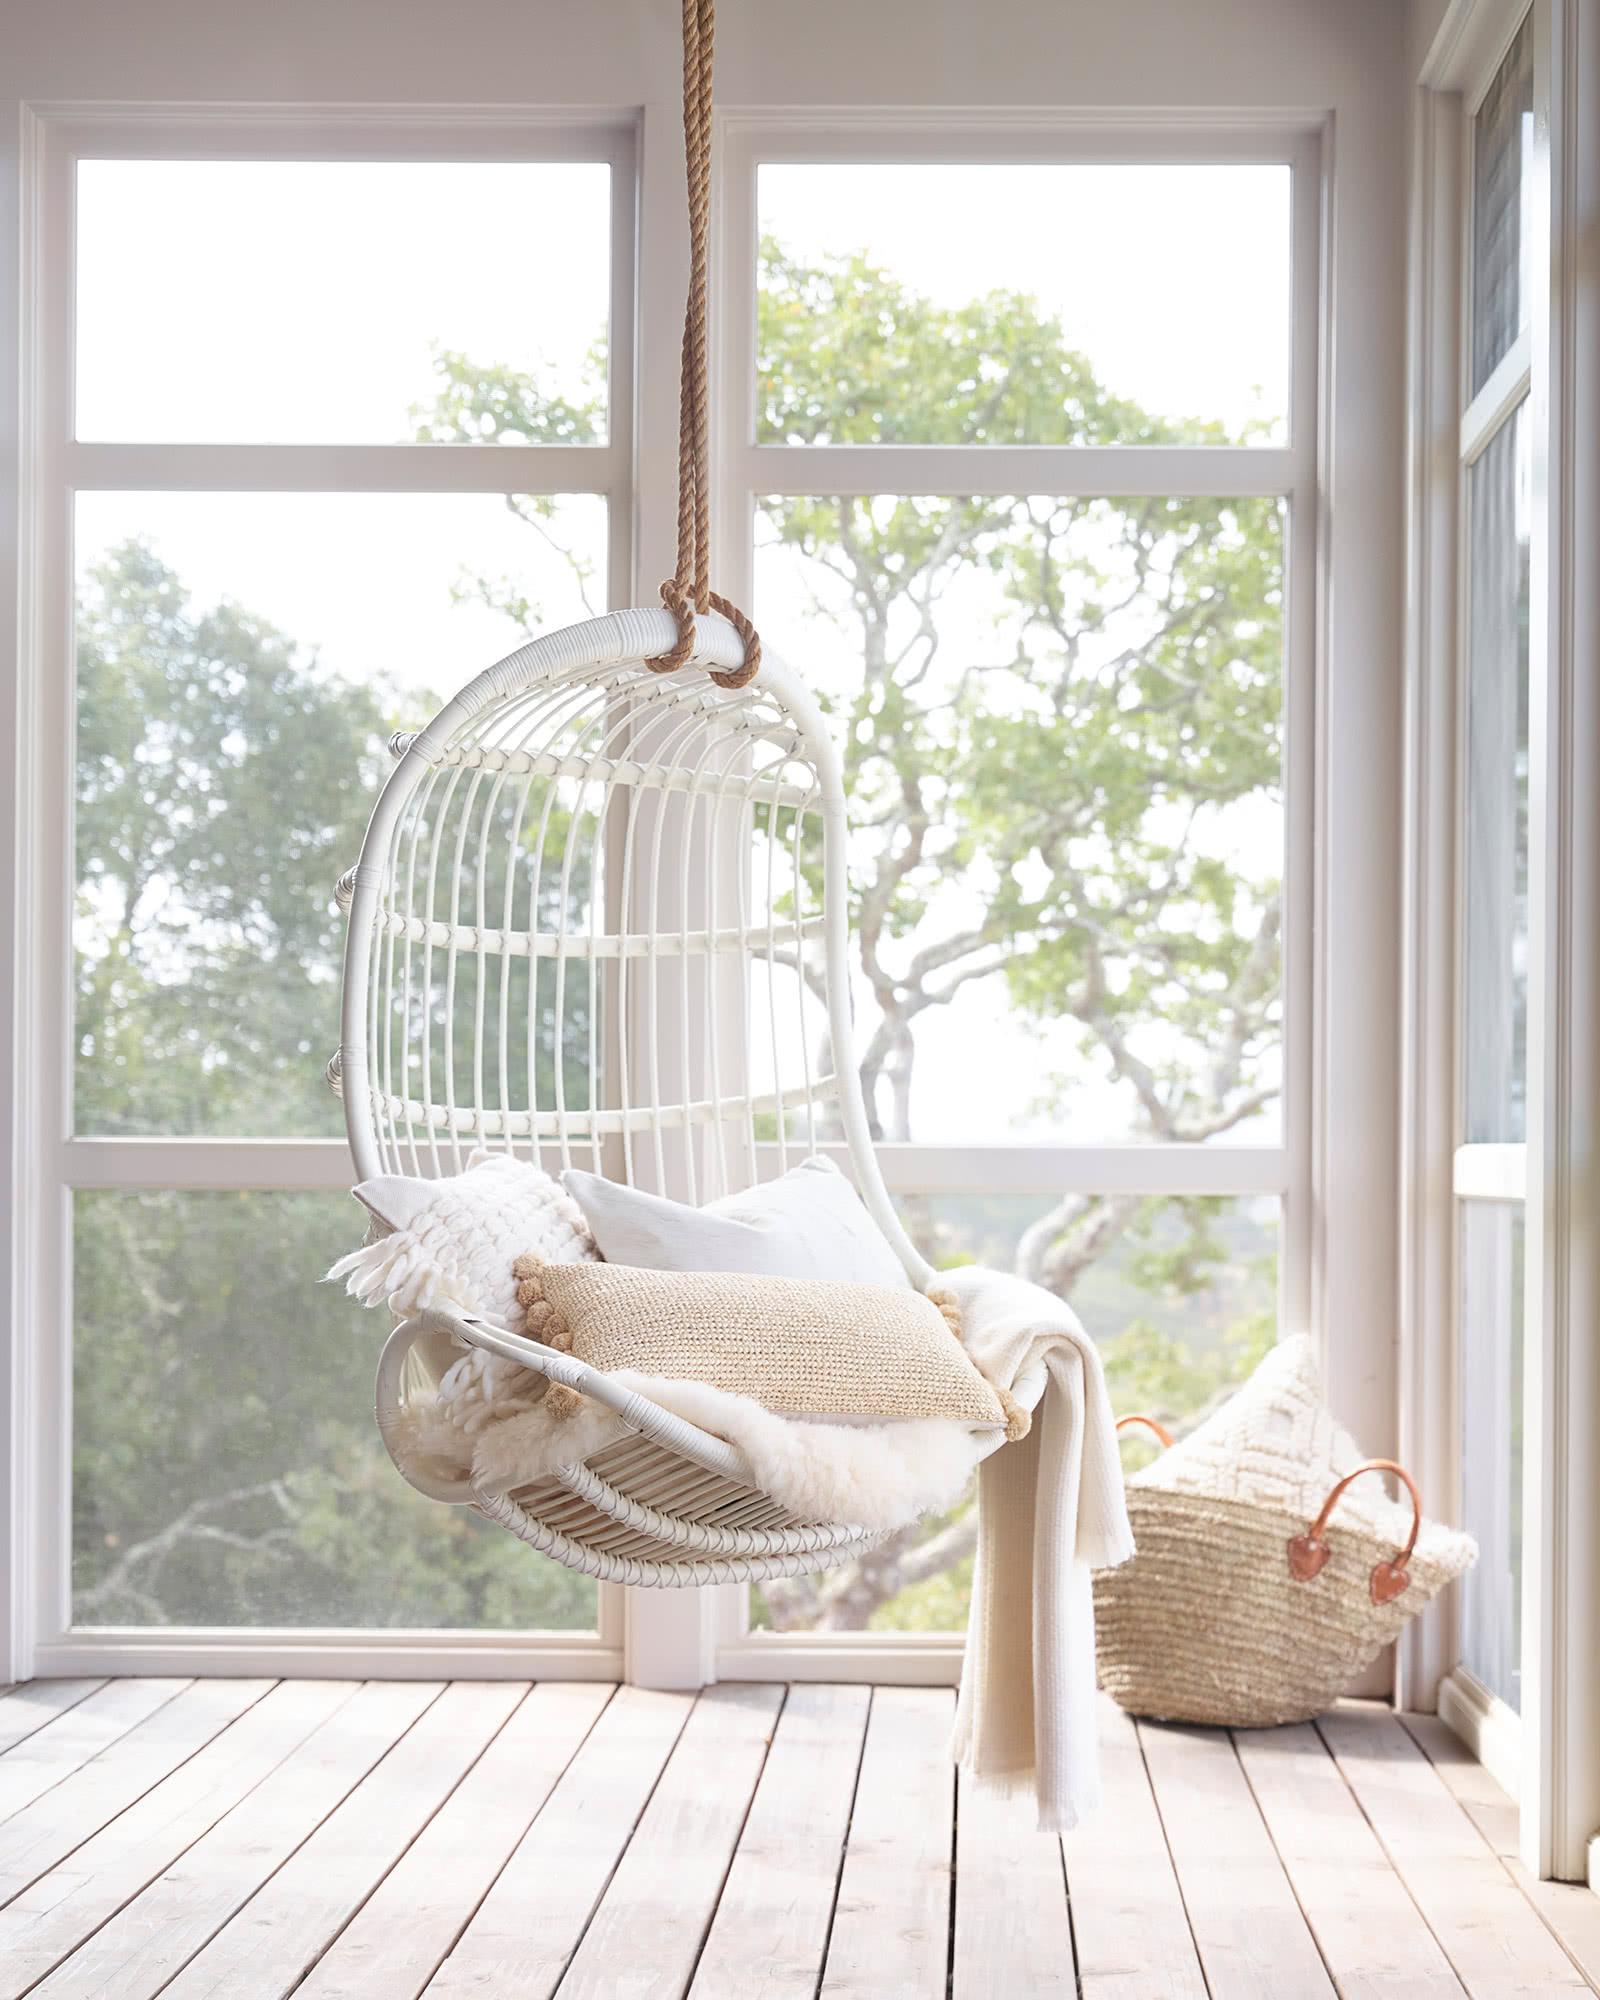 Hanging Rattan Chair $498.00